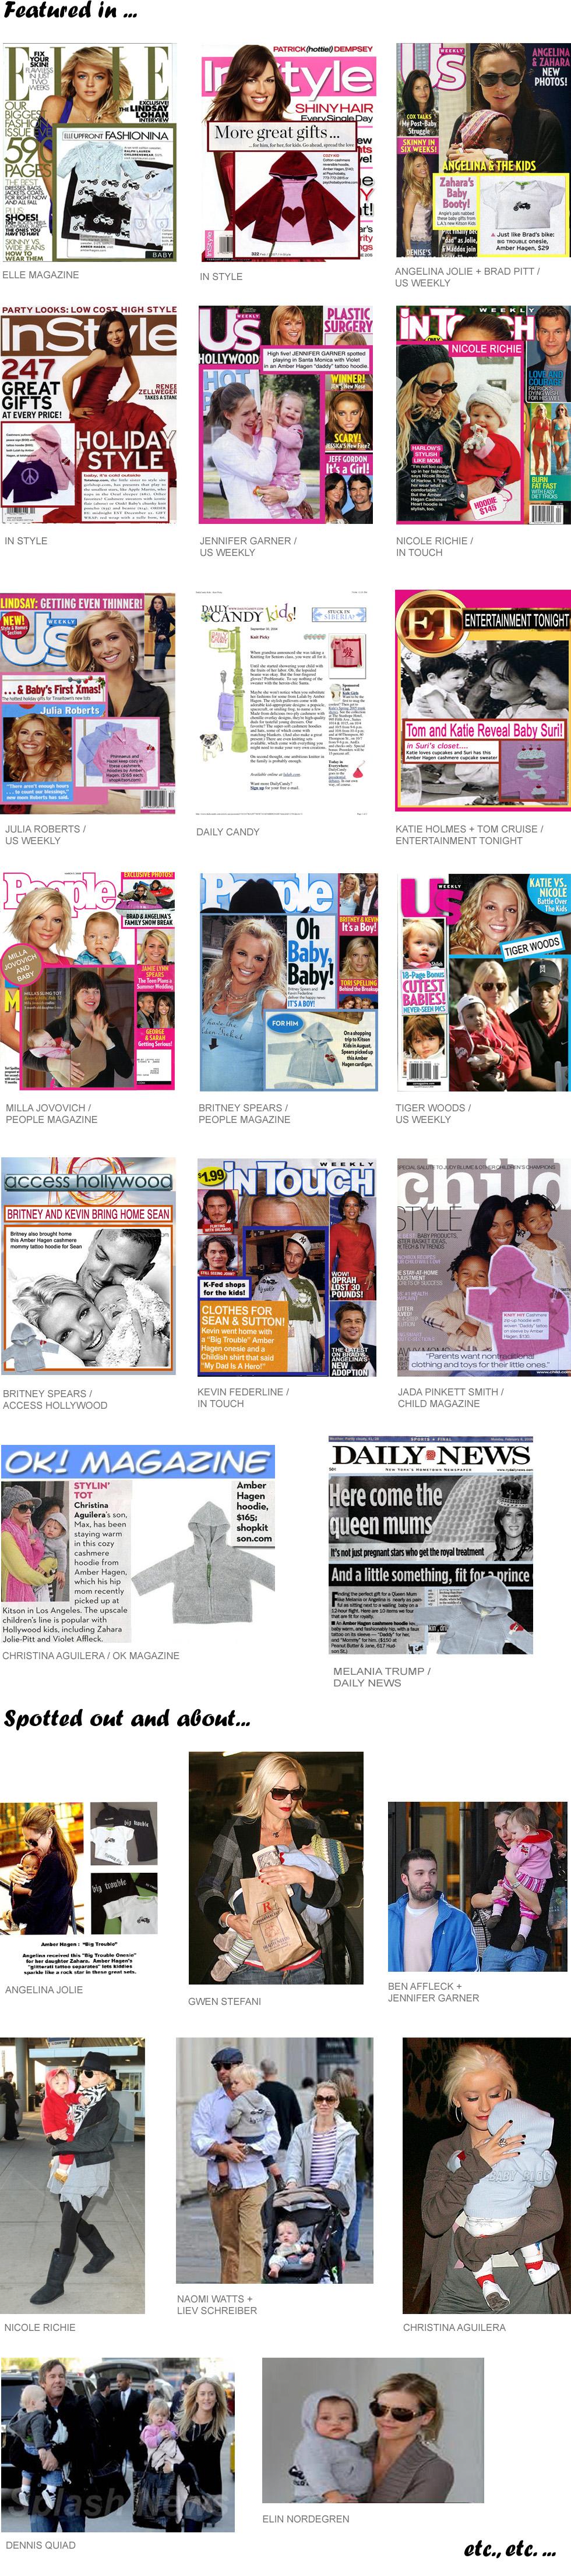 press-page-small-2.jpg